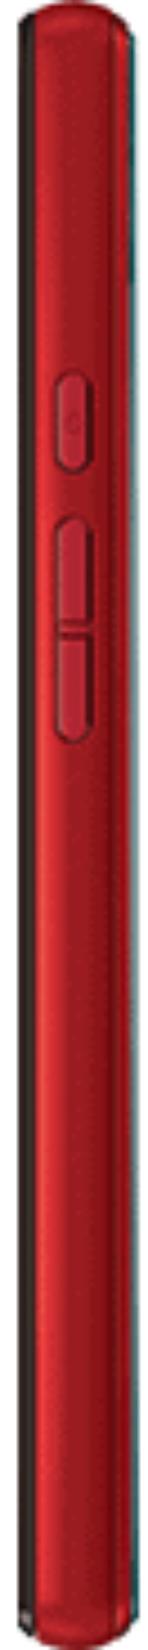 sharp aquos mini sh mo3 6